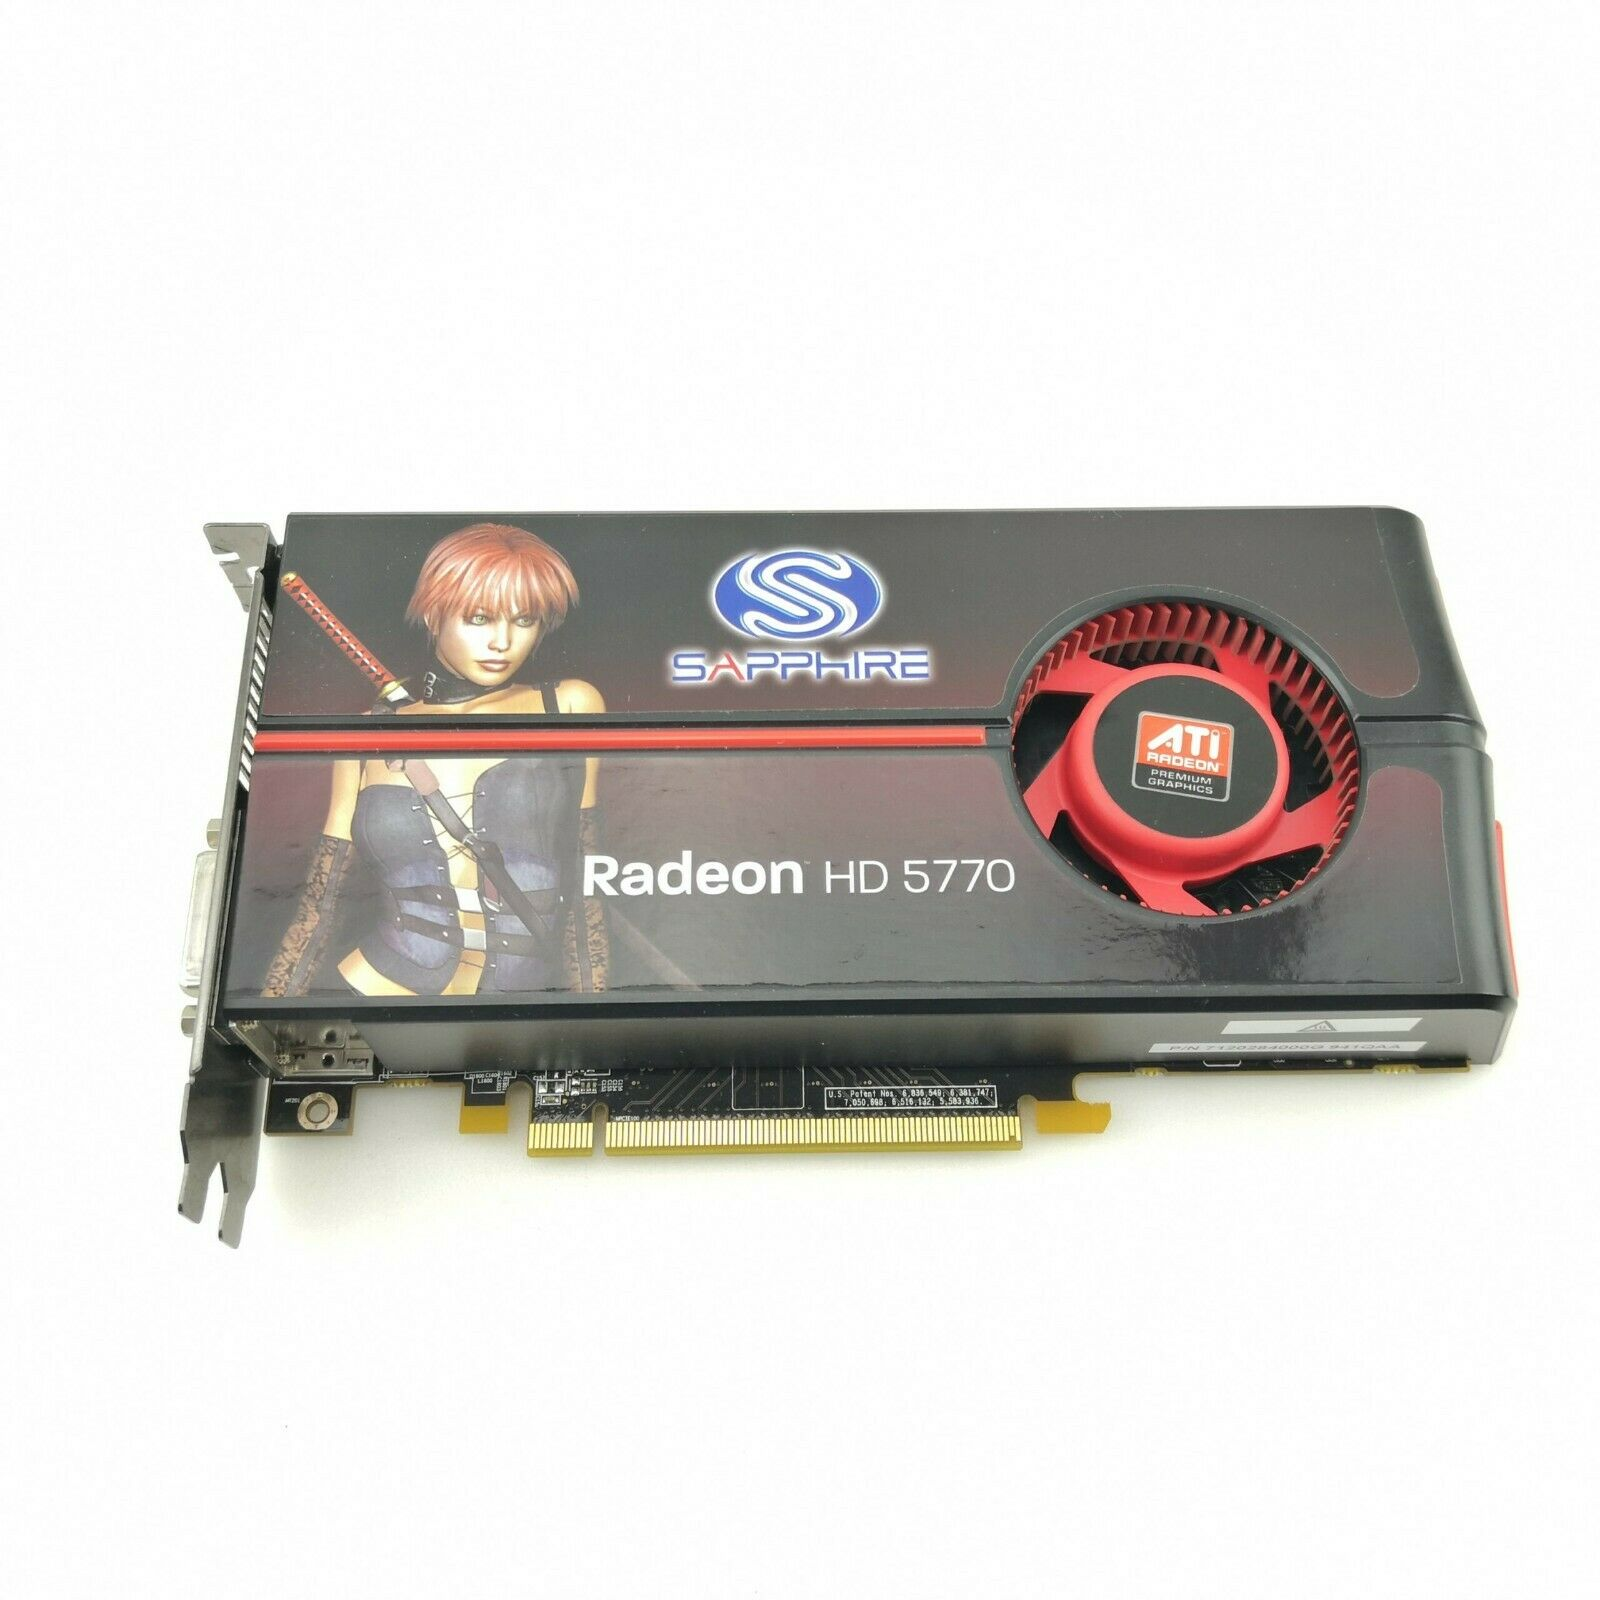 ATI Radeon HD 5770 Sapphire 1 Gb GDDR 5 Graphics Card